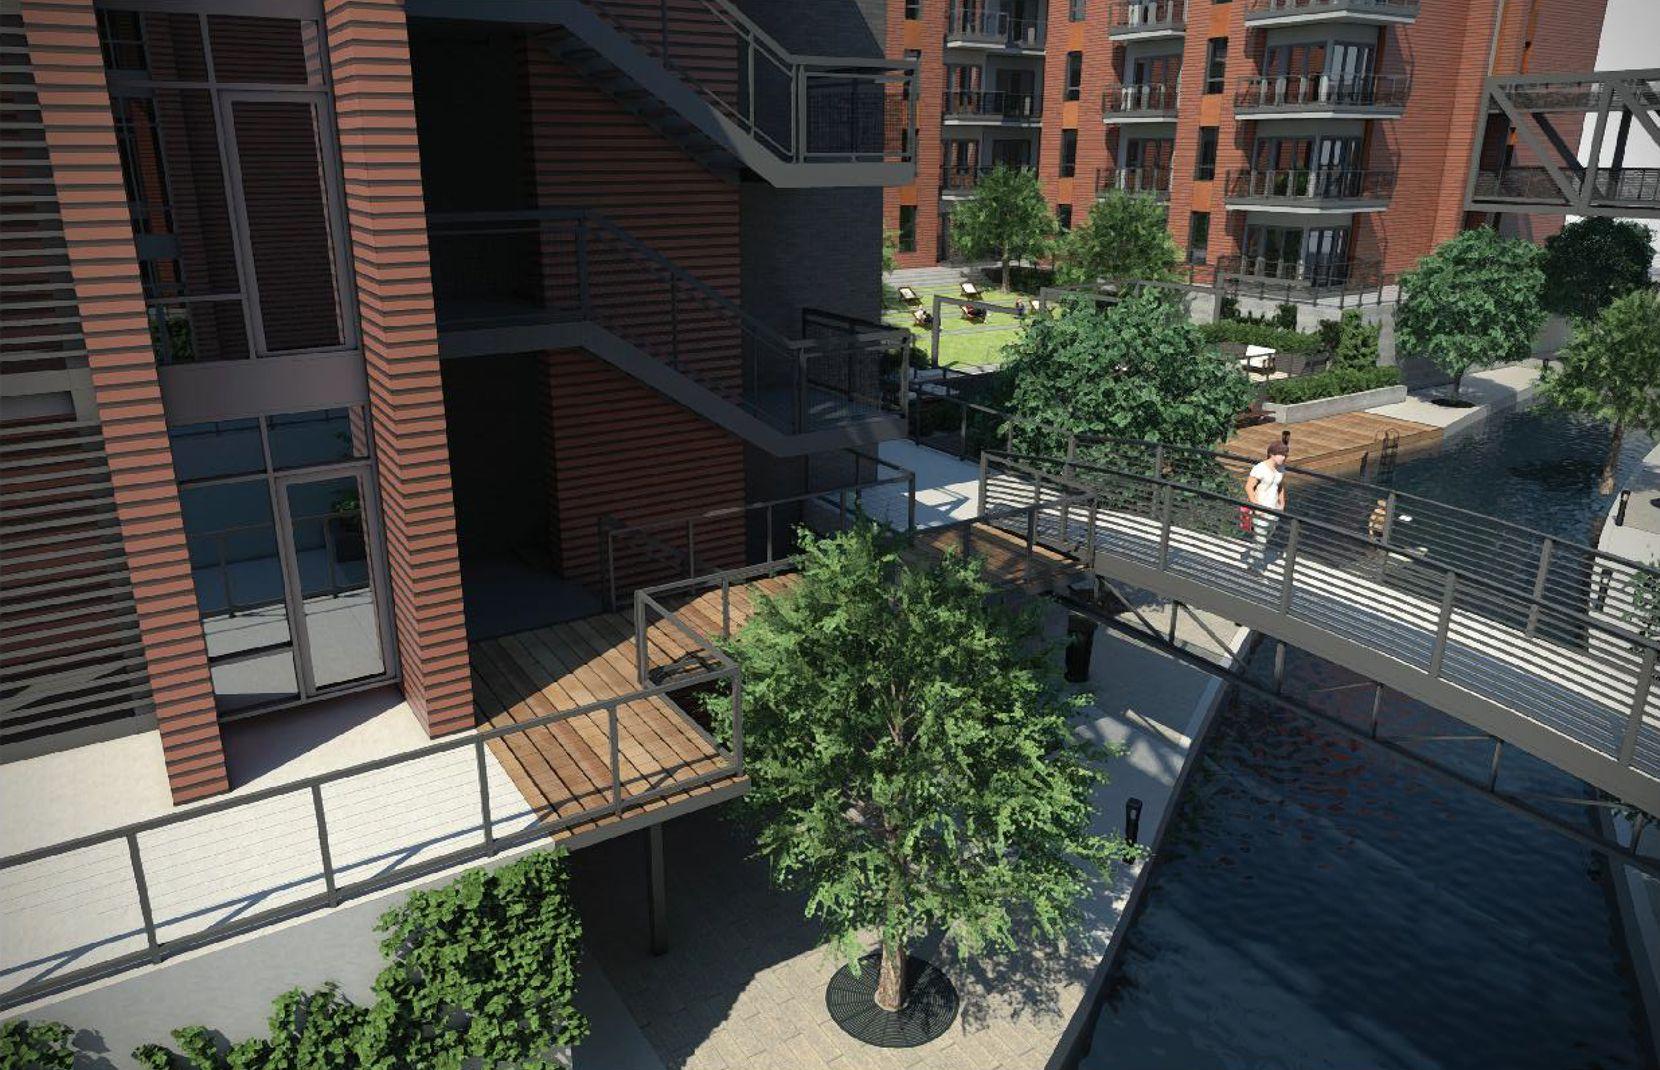 Encore's Riverwalk apartments will open in 2018.